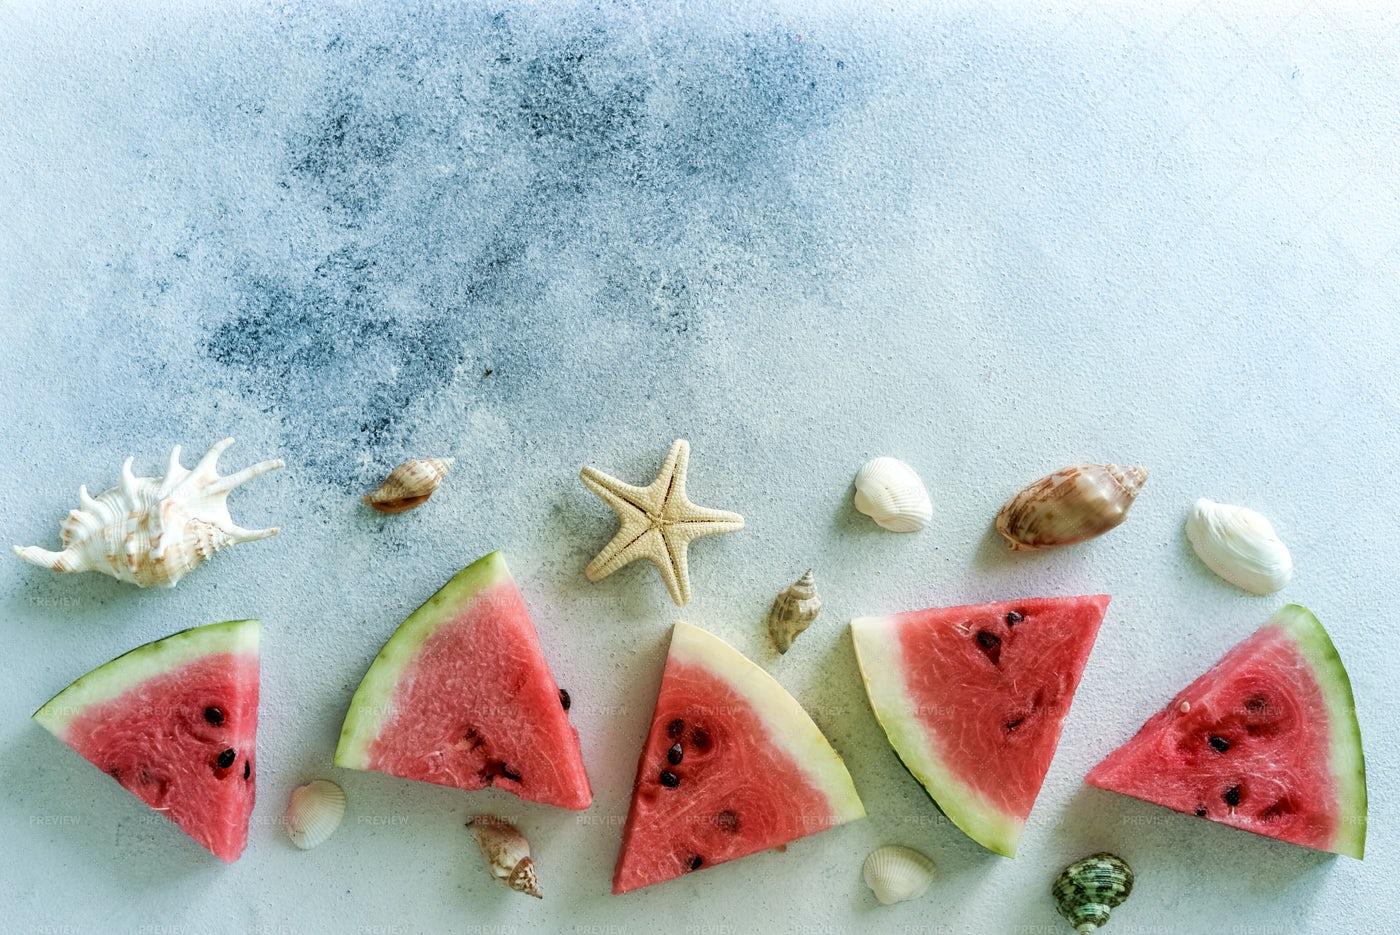 Summer Watermelon Beach Background: Stock Photos